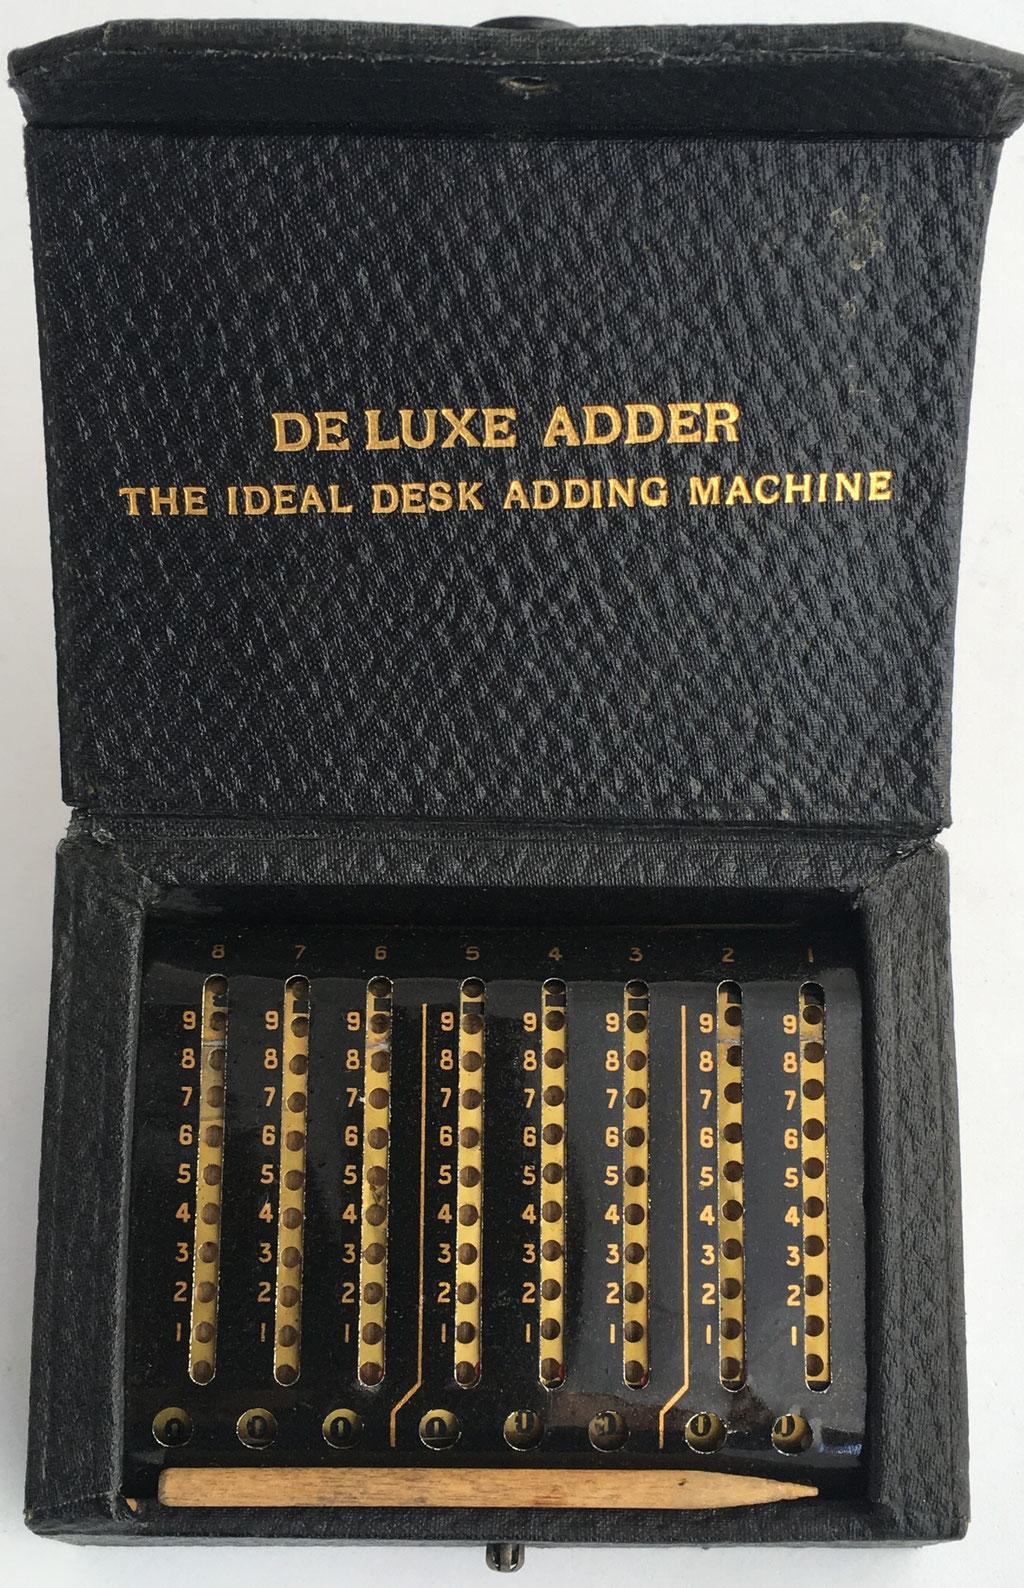 The BASSETT Adder (the luxe adder, the ideal desk adding machine), año 1909, 12x9x5 cm